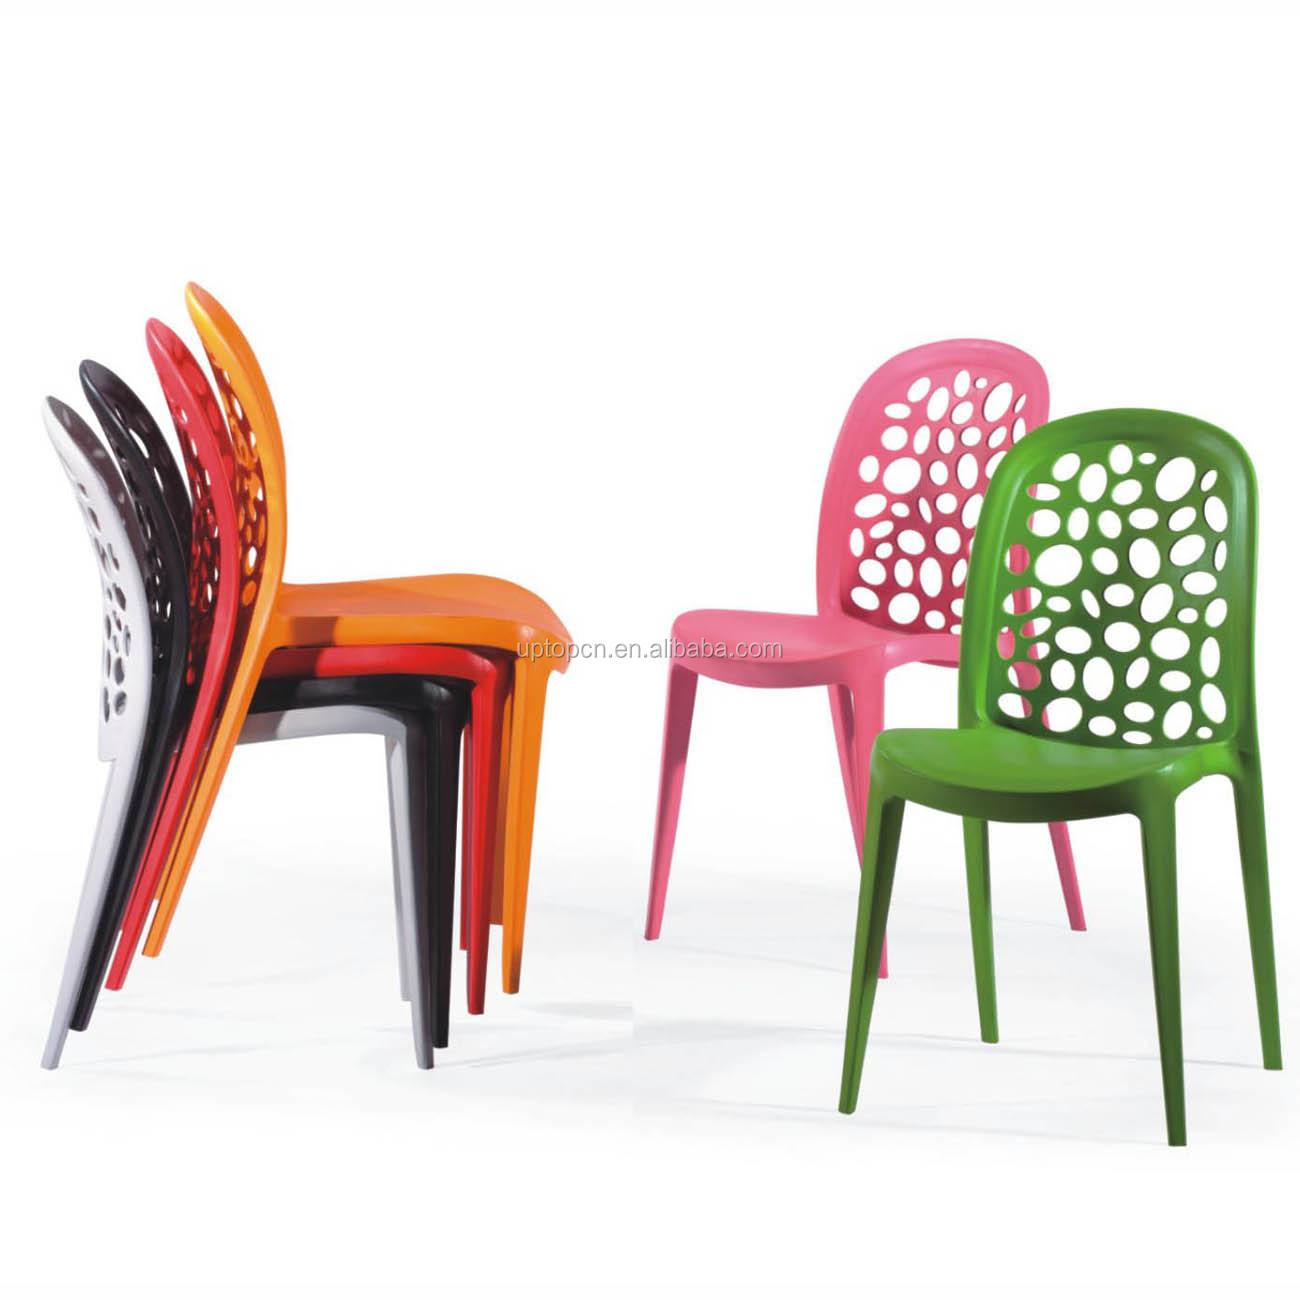 Patio coffee shop leisure plastic chair wholesale  SP UC316 Patio Coffee Shop Leisure Plastic Chair Wholesale  sp uc316    Buy  . Plastic Chairs Wholesale. Home Design Ideas